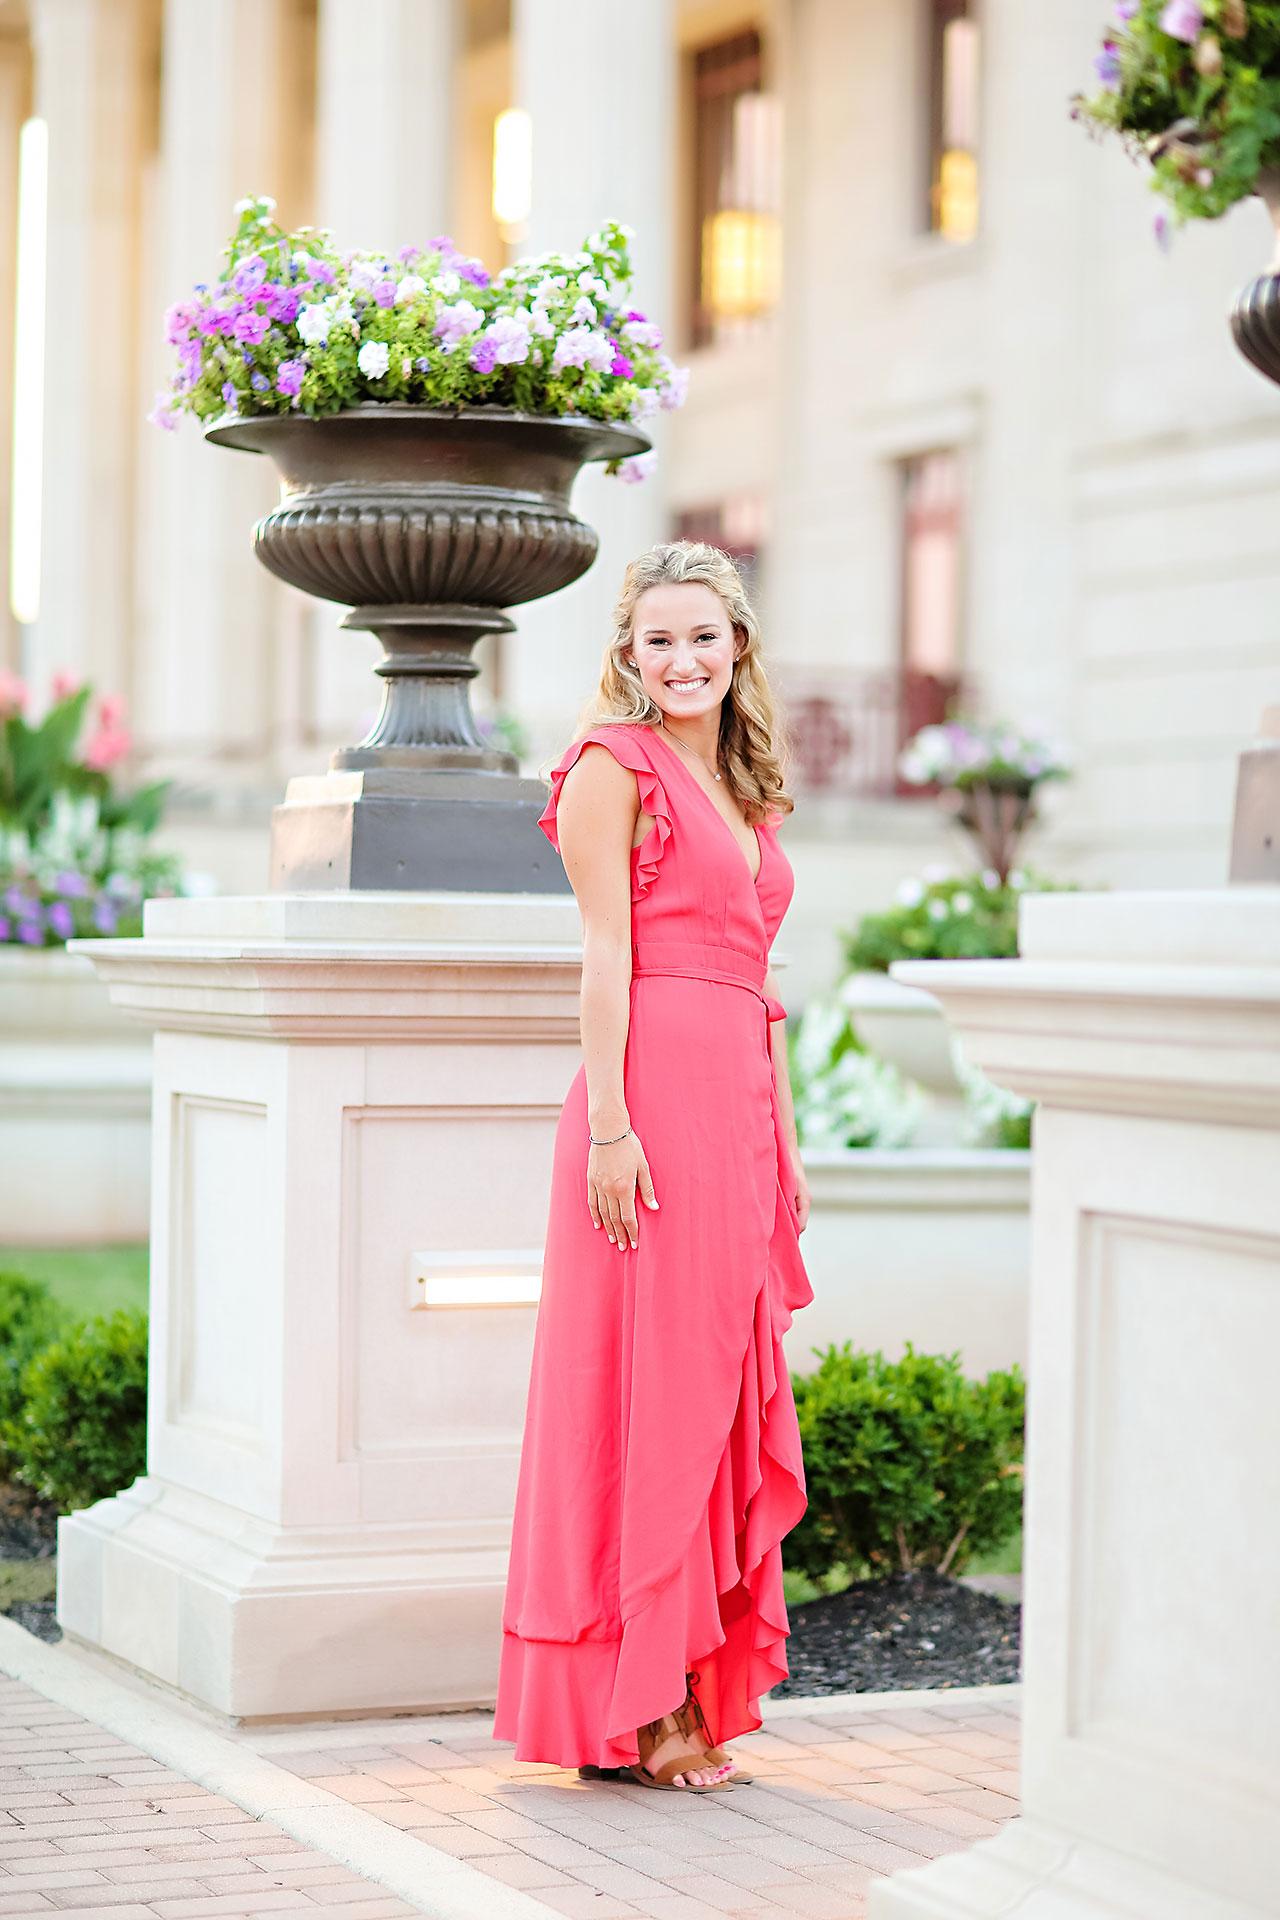 Samantha Nate Carmel Engagement Session 171